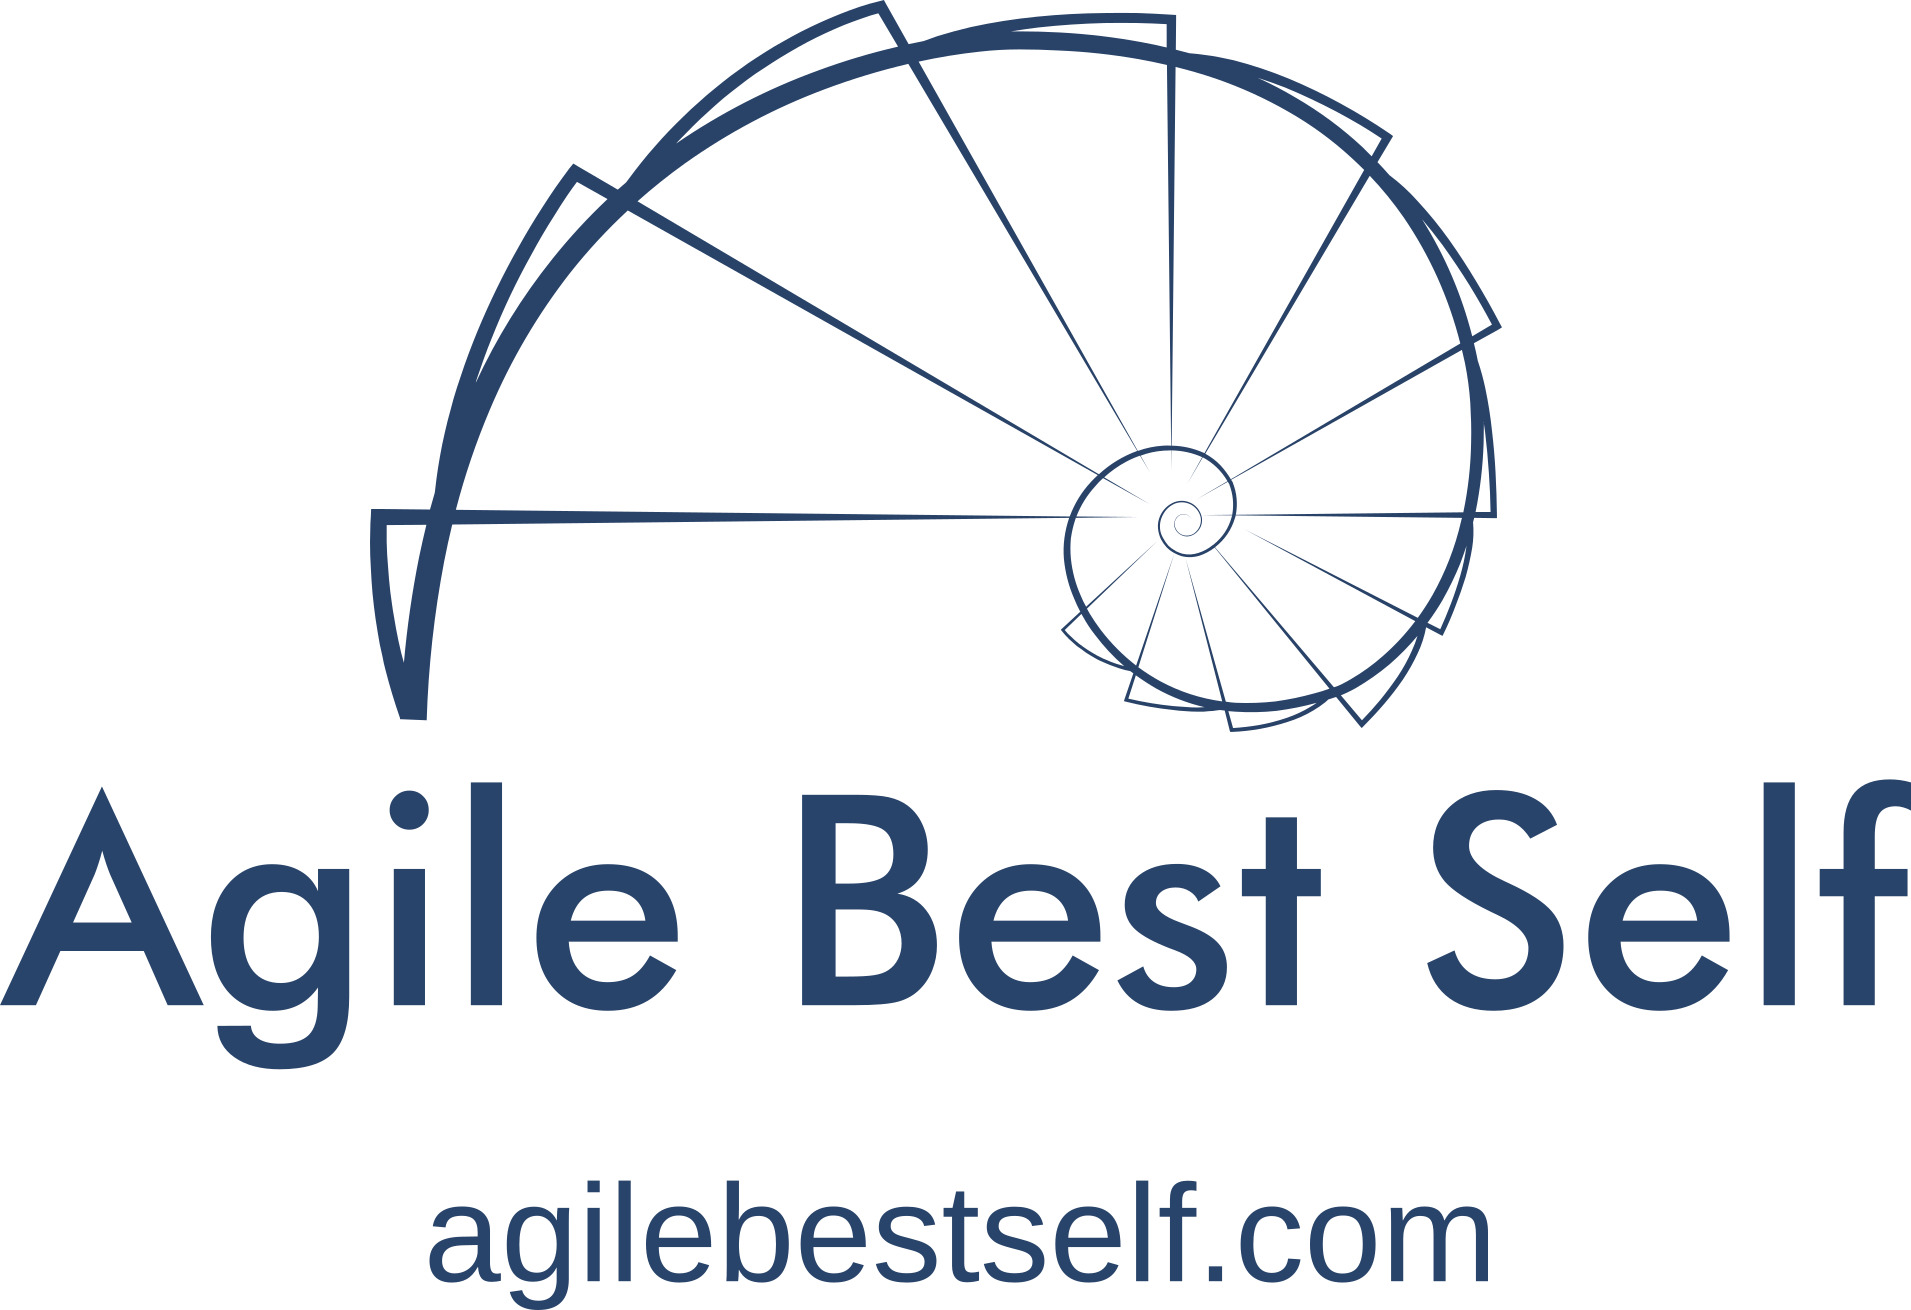 Agile Best Self